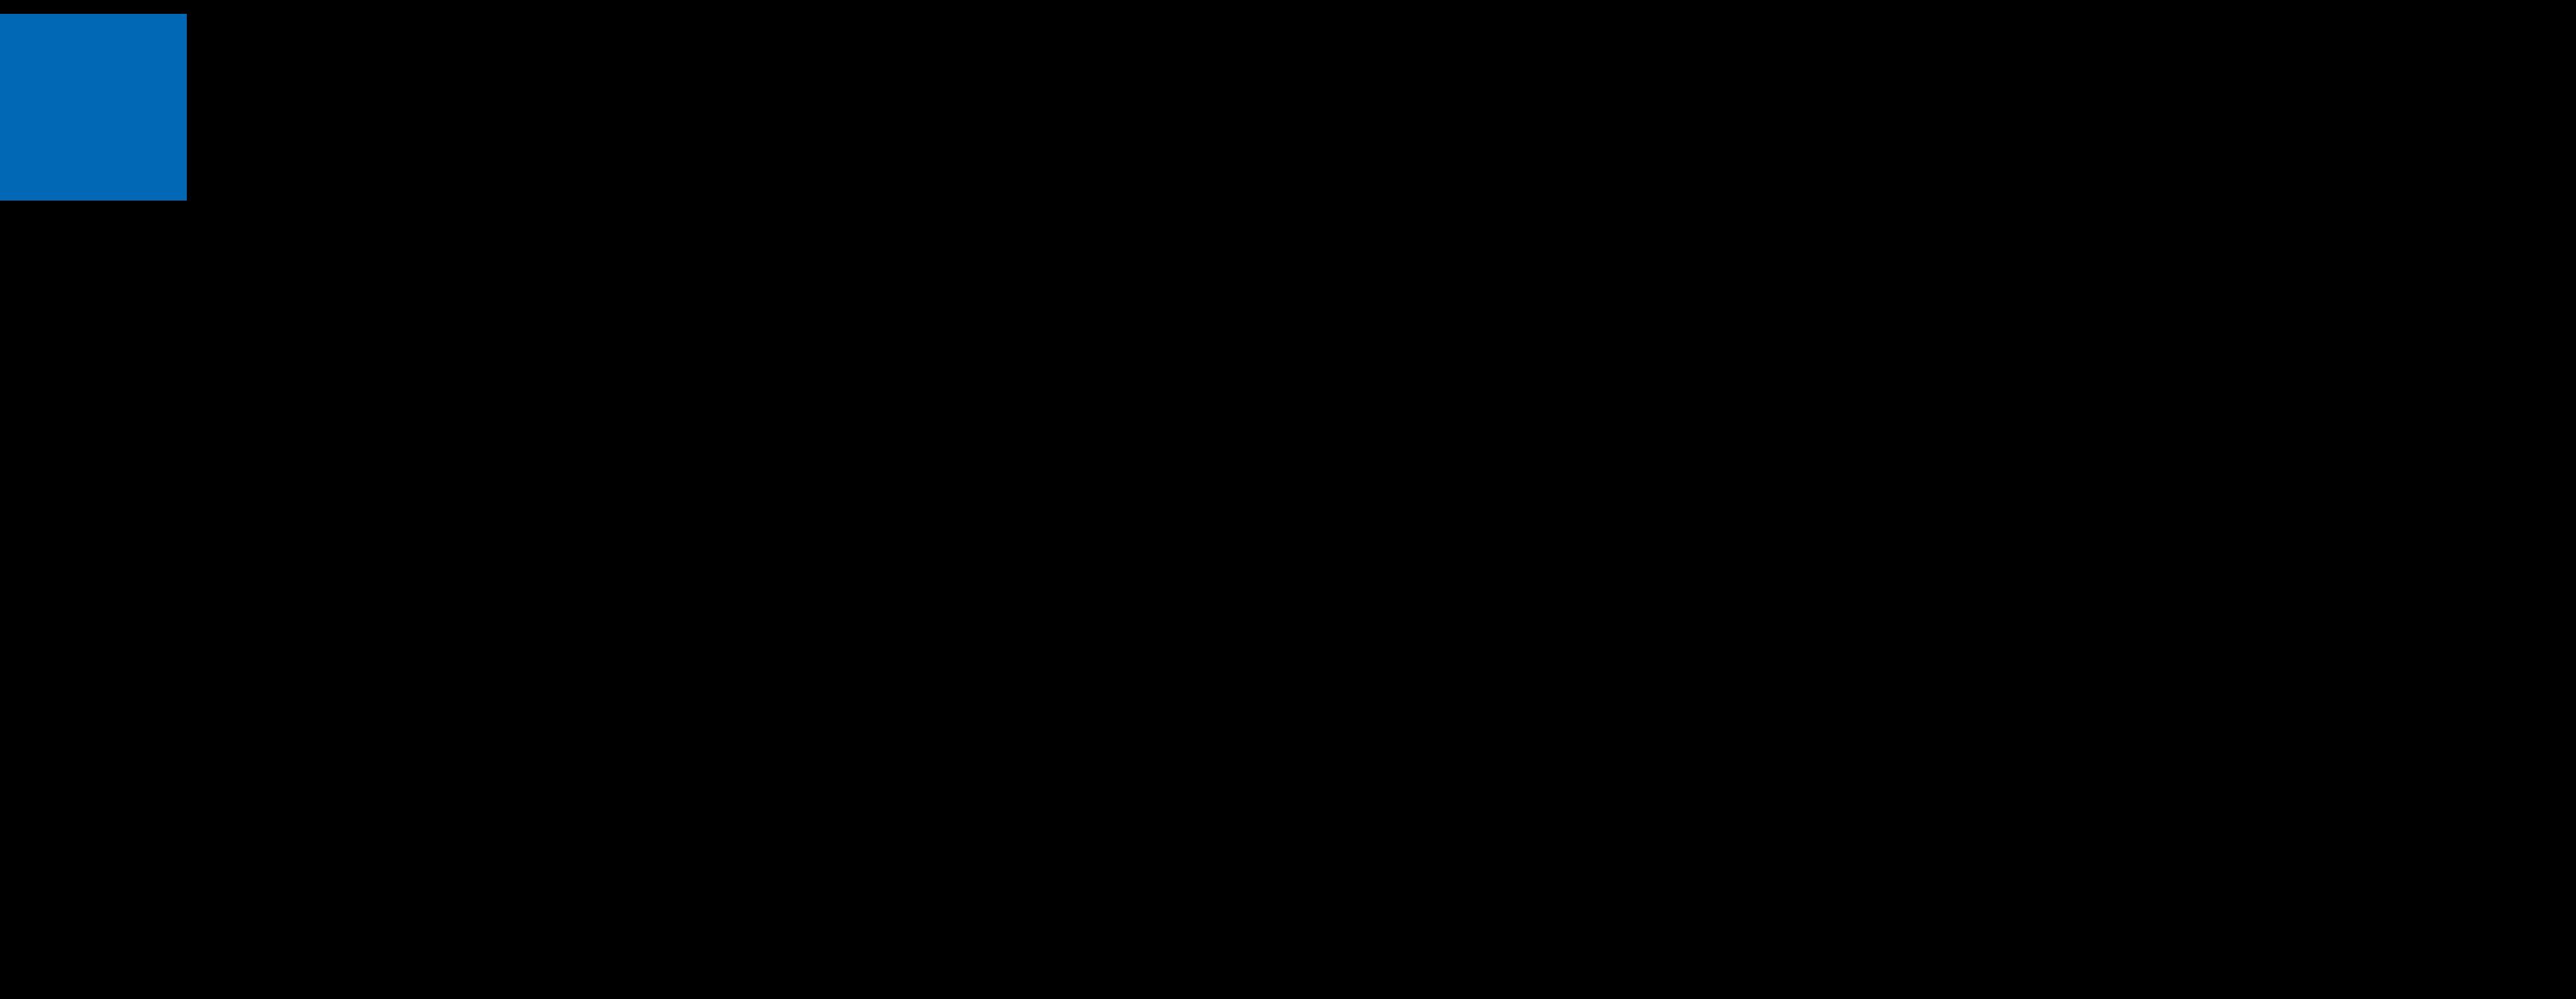 intel logo 8 - Intel Logo